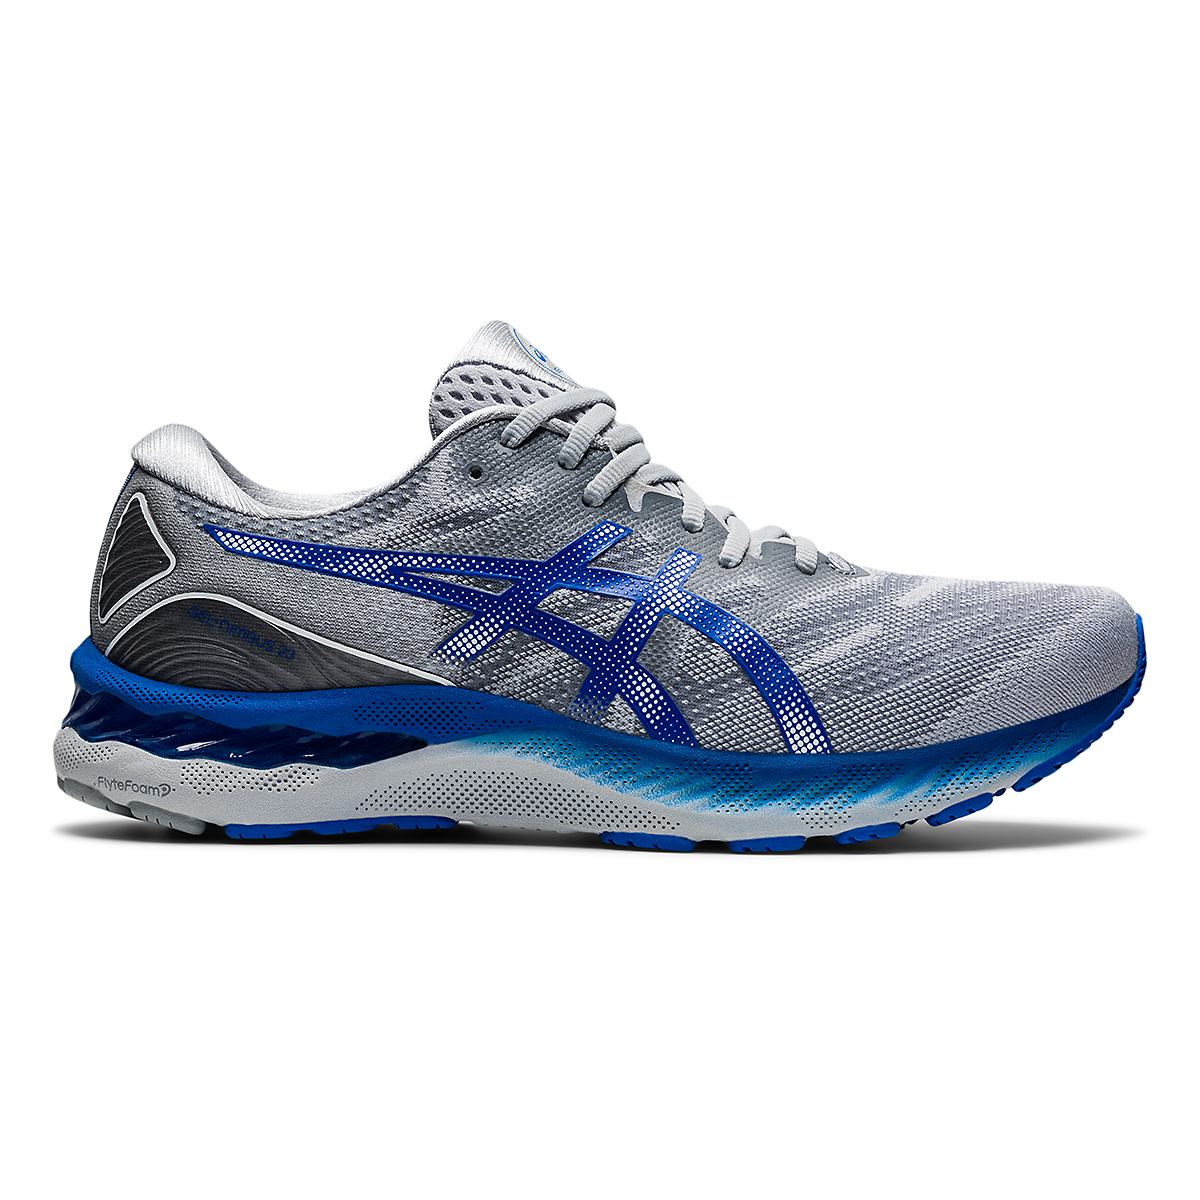 Men's Asics Gel-Nimbus 23 Running Shoe - Color: Piedmont Grey - Size: 6 - Width: Regular, Piedmont Grey, large, image 1